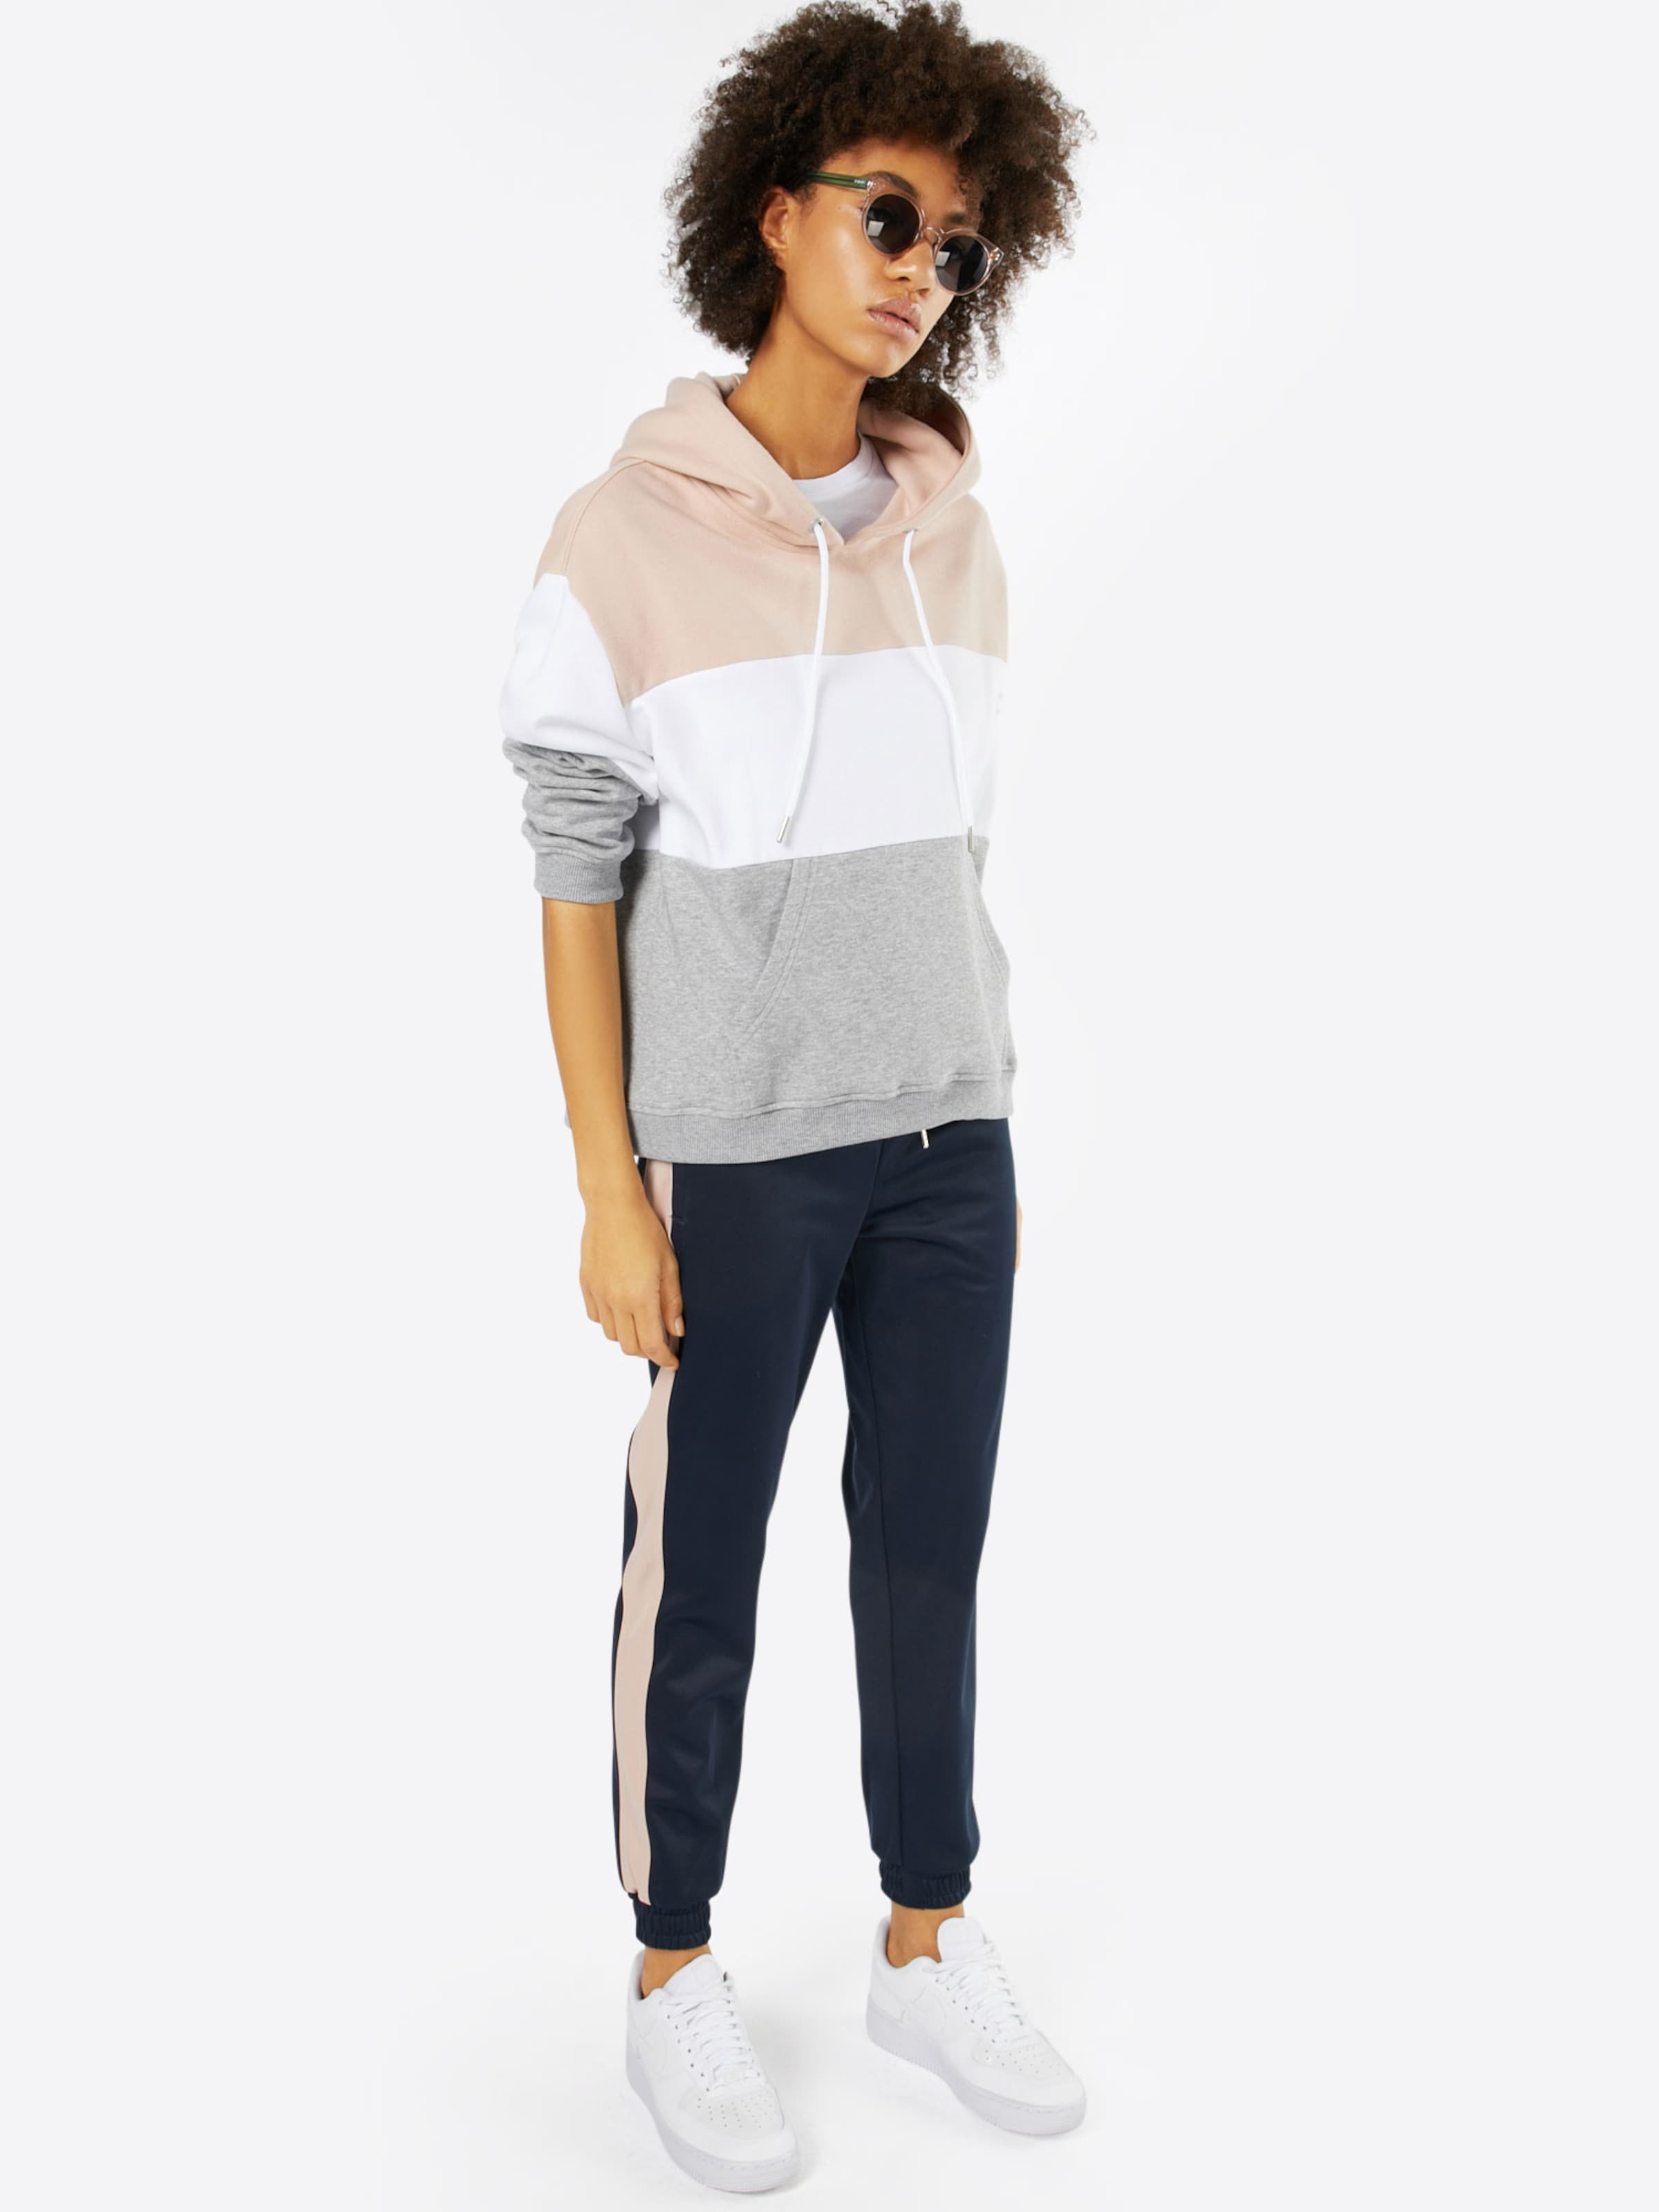 Urban Classics Sweatshirt '3-Tone Hoody' Manchester Online Auslass Sneakernews Rabatt Viele Arten Von Rabatt Billig nillVzpWZ